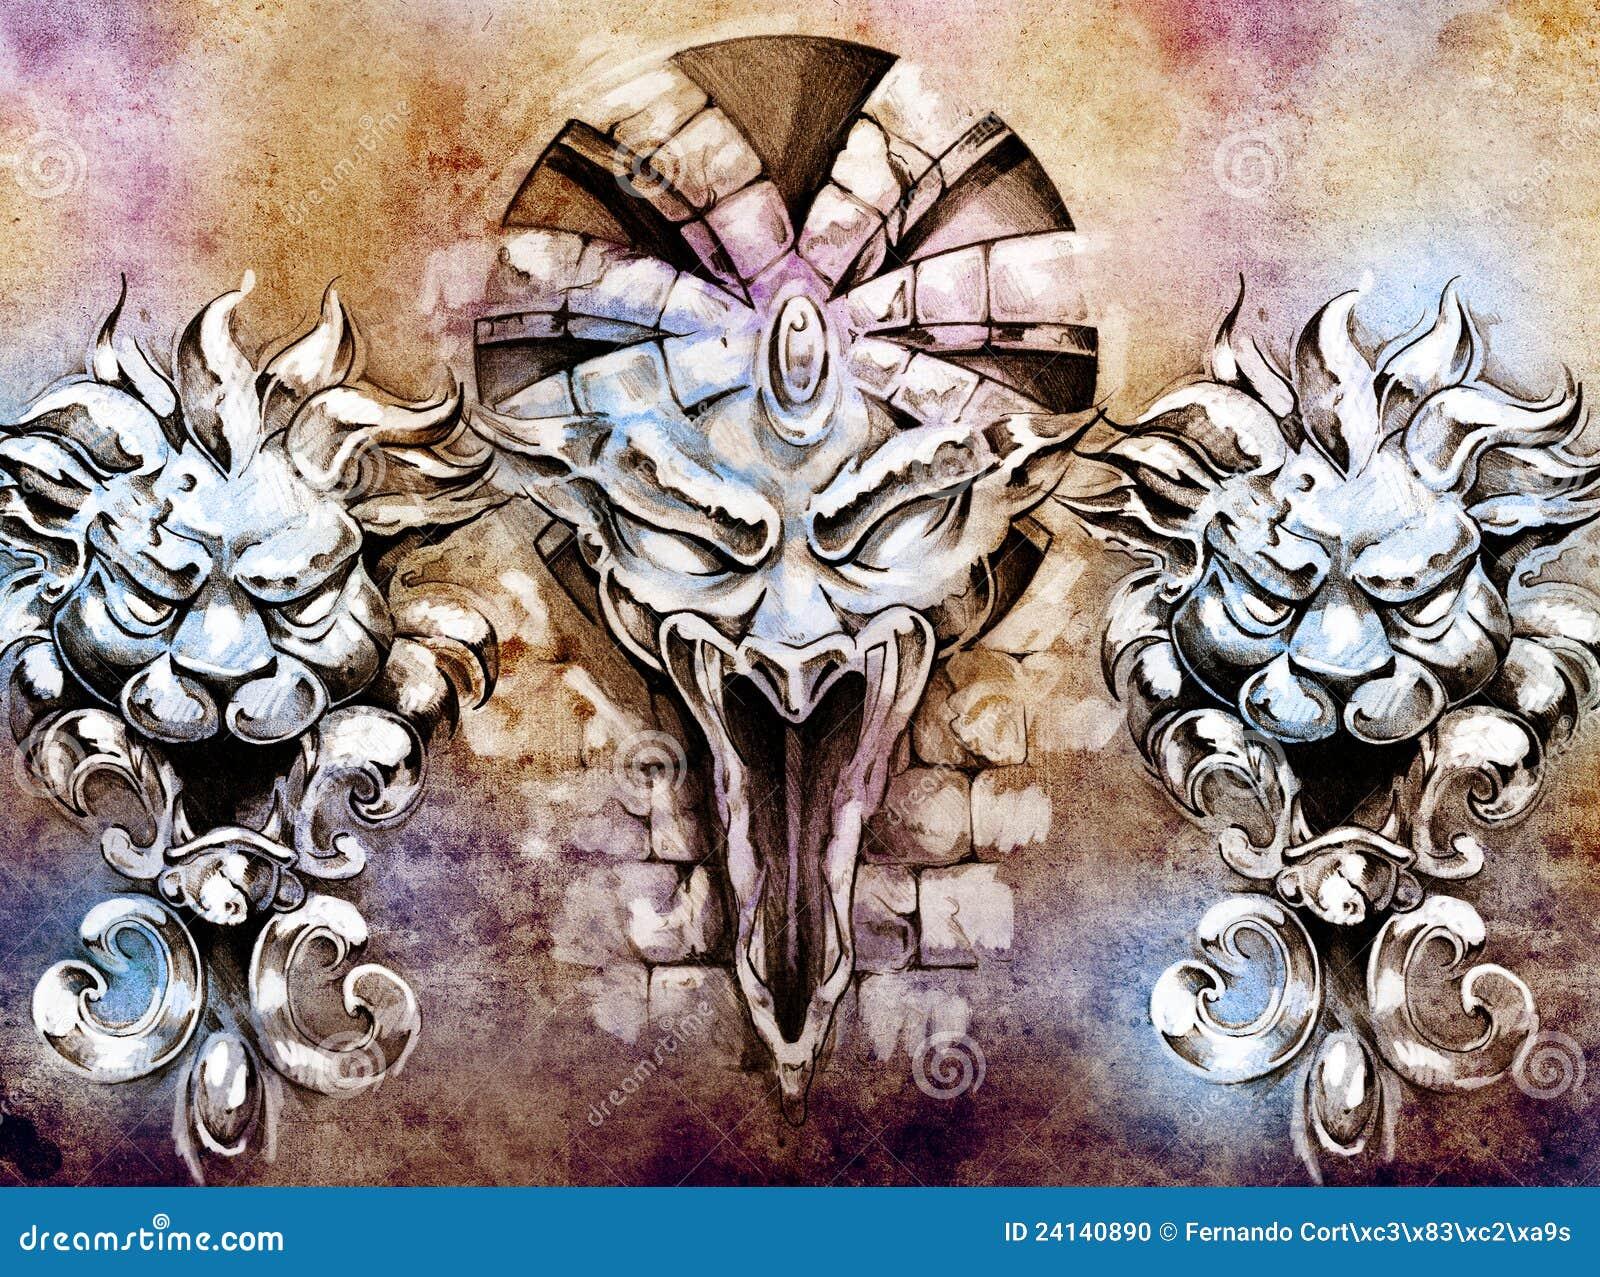 tattoo art fantasy medieval gargoyle stock photo image 24140890. Black Bedroom Furniture Sets. Home Design Ideas